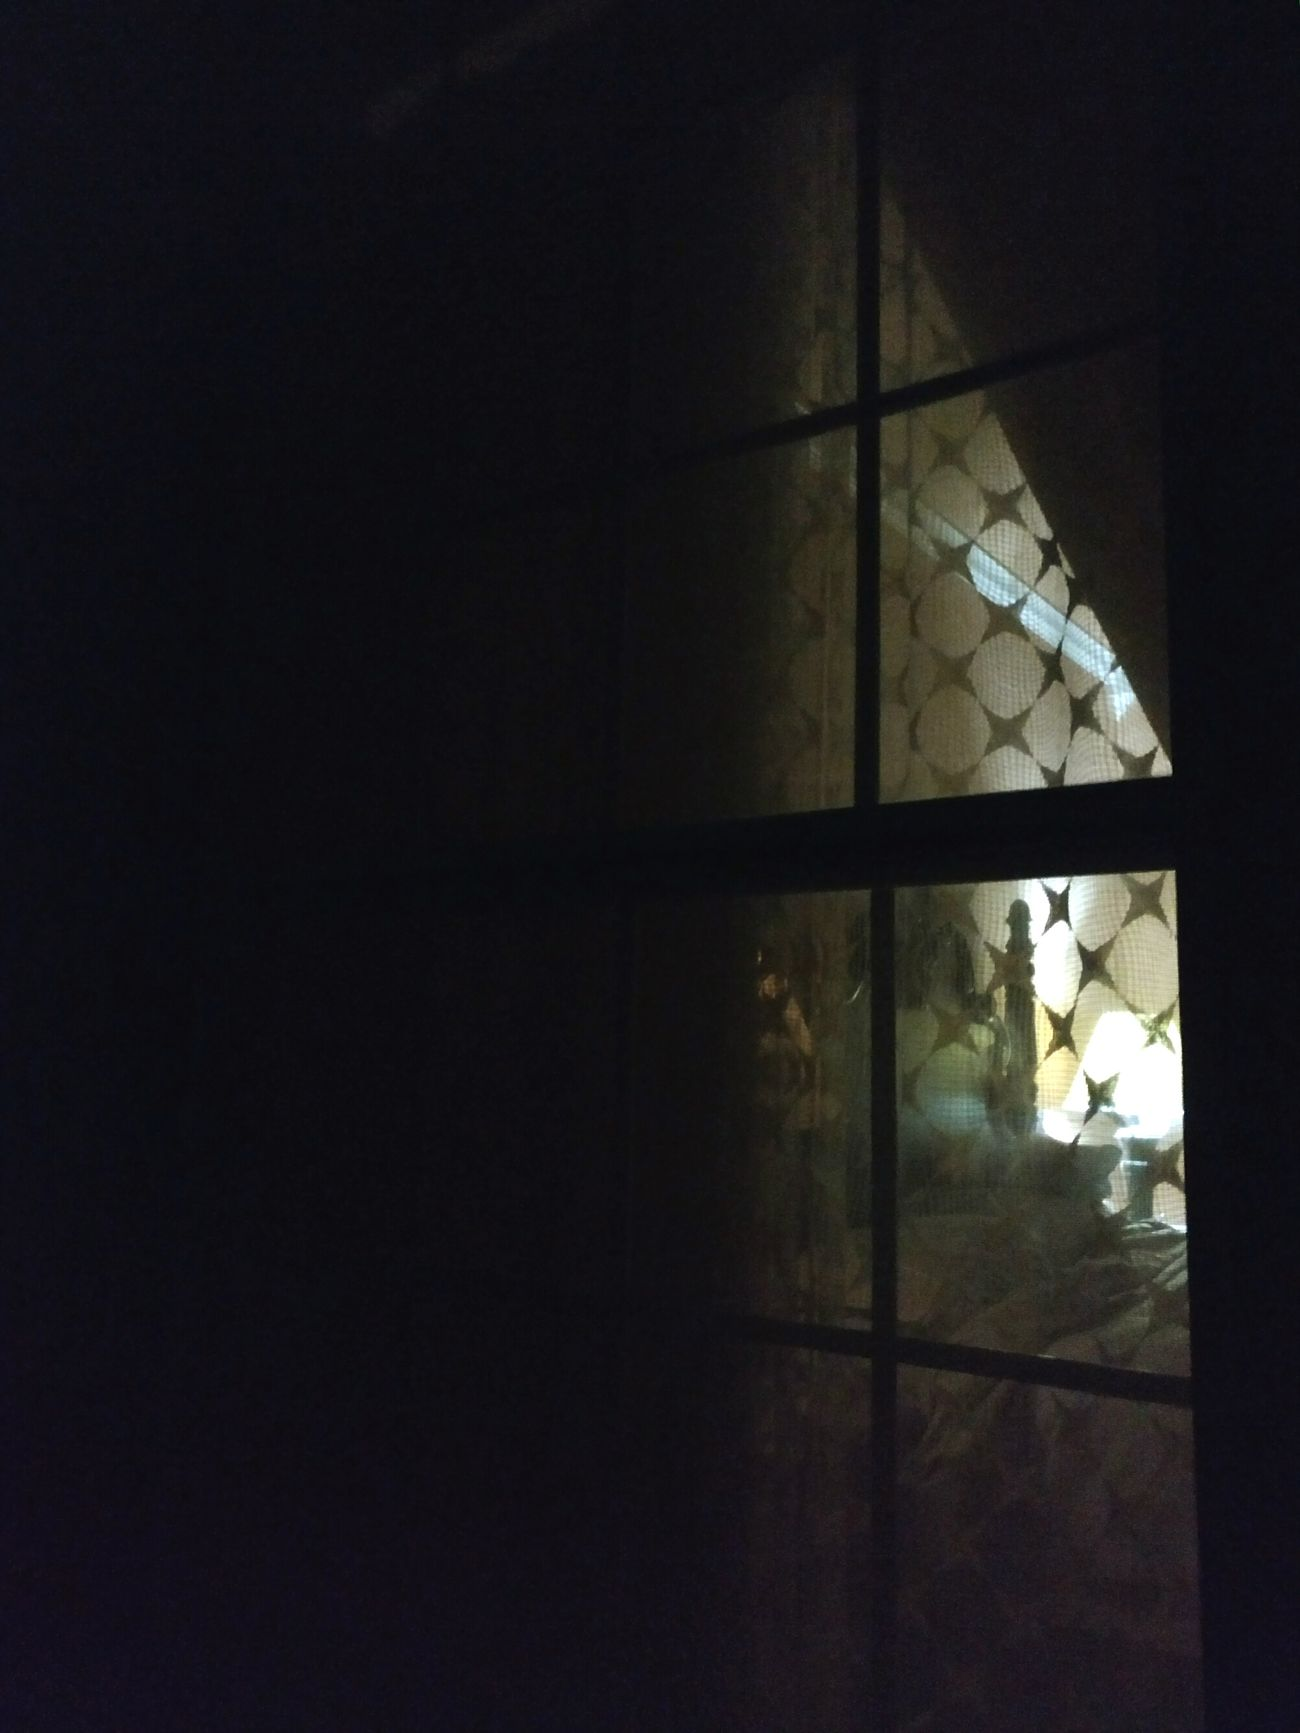 Window Home Interior LastNight Glimpseofabedroom Catsview Windowcollection No People